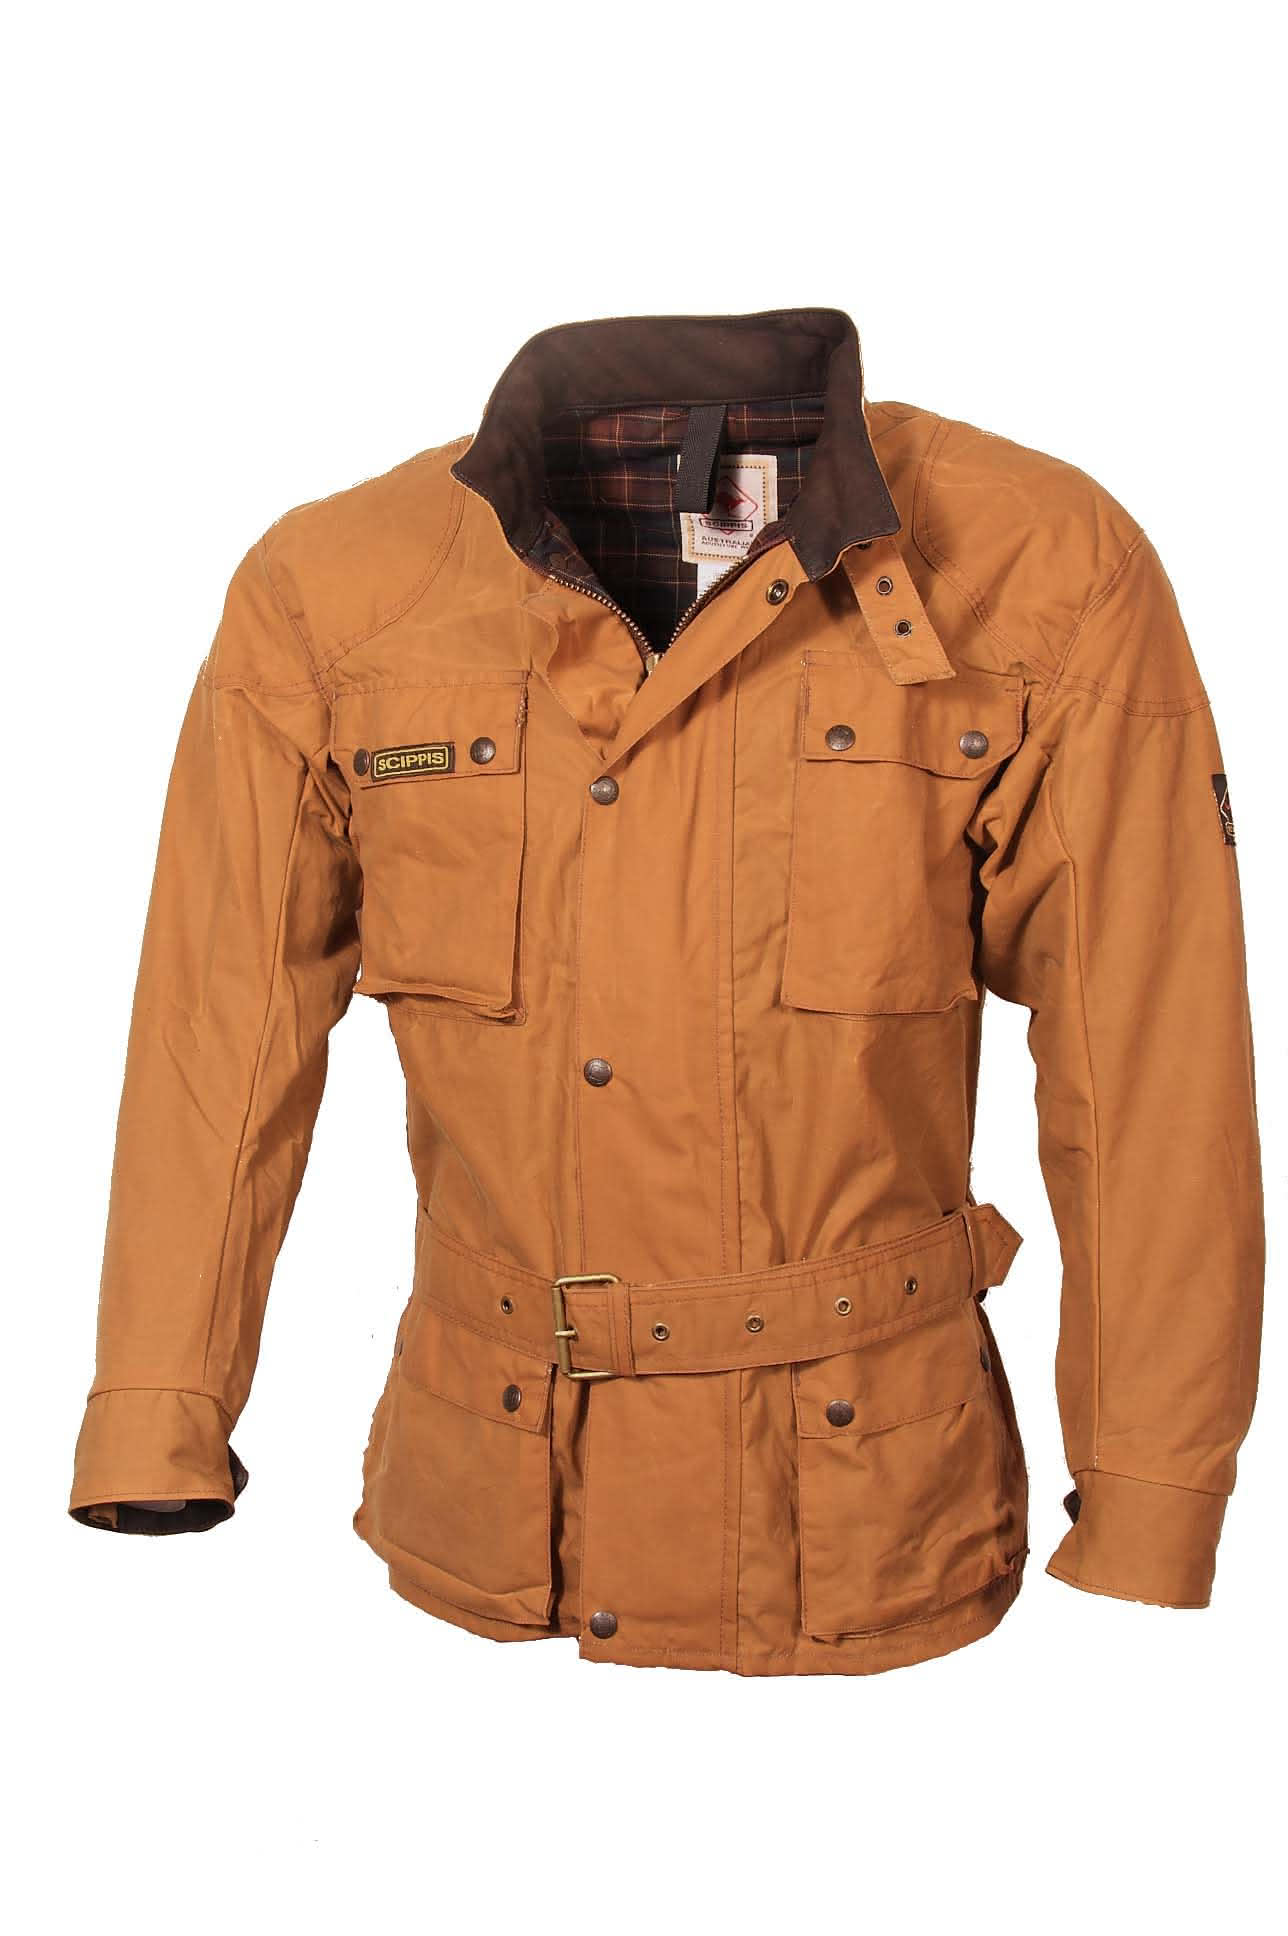 Scippis Belmore Jacket - 2J16 - Tan-L